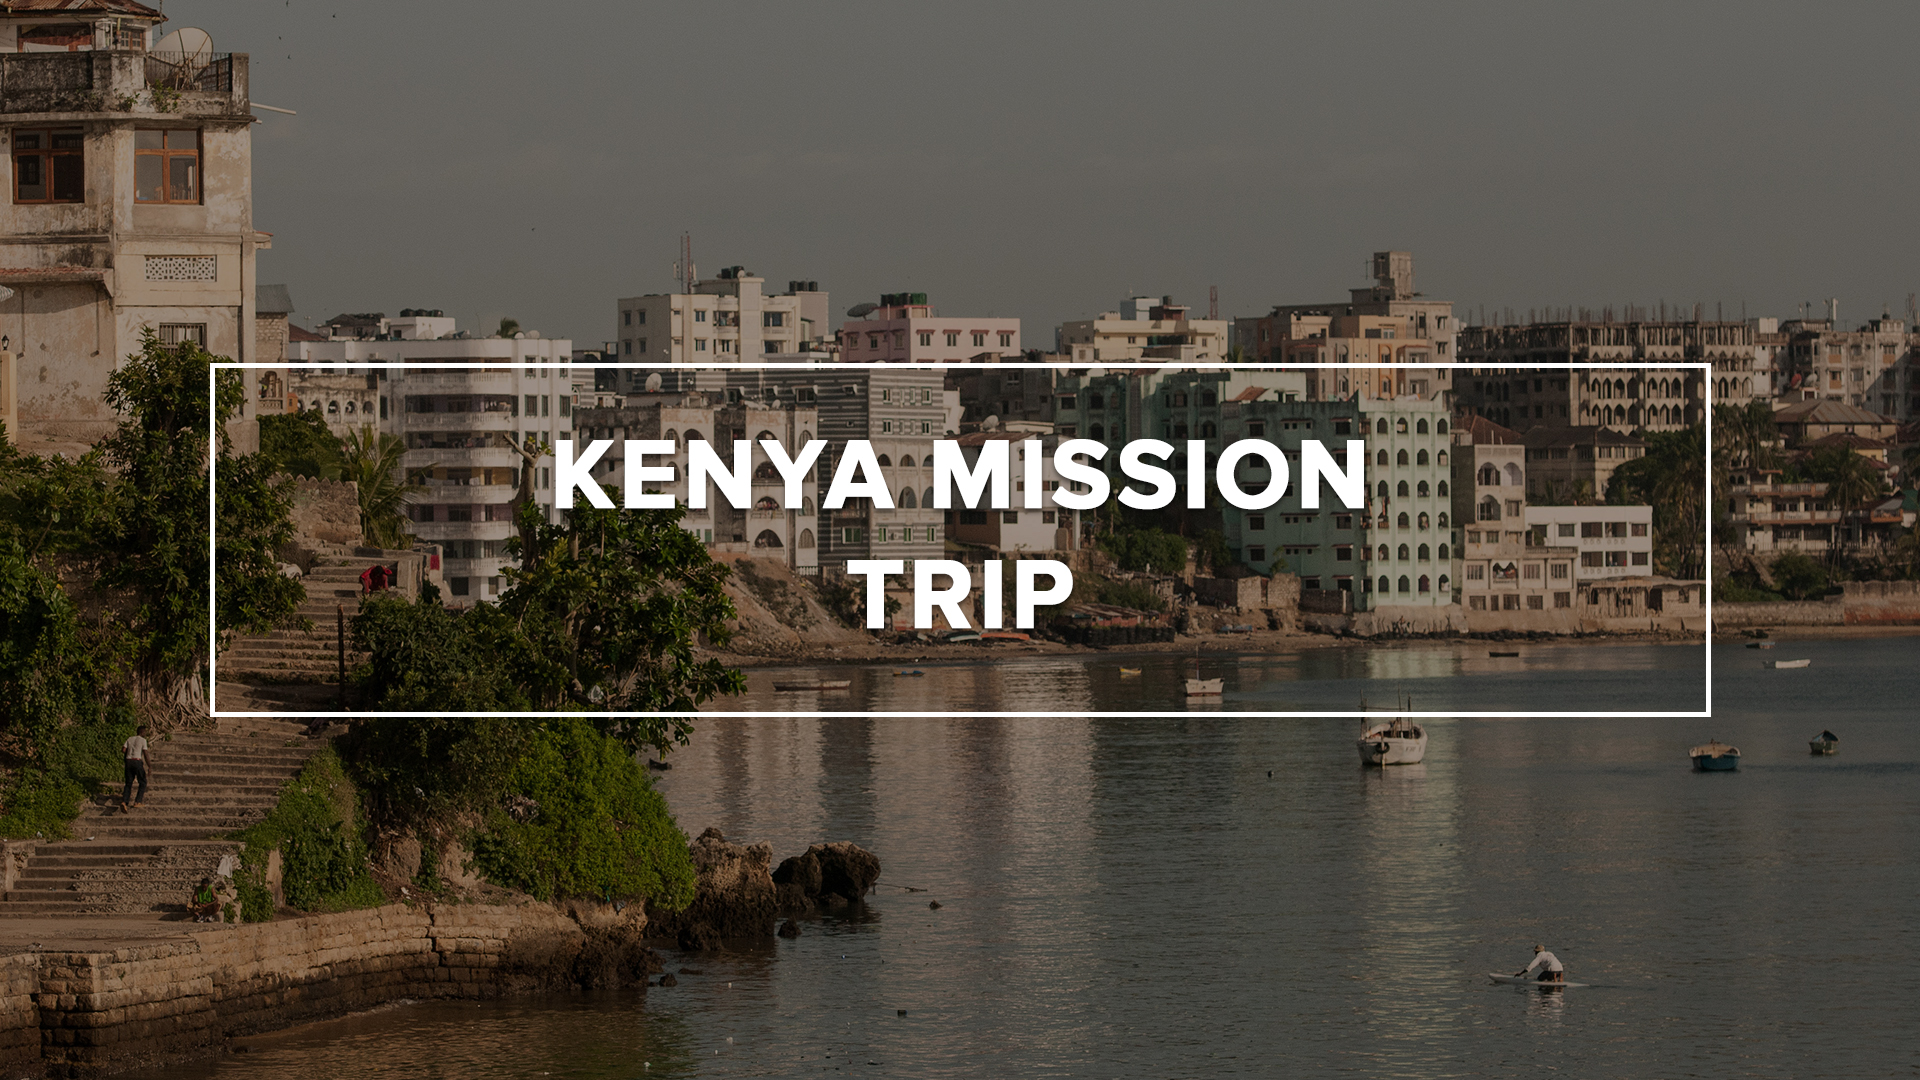 Kenya Mission Trip.jpg